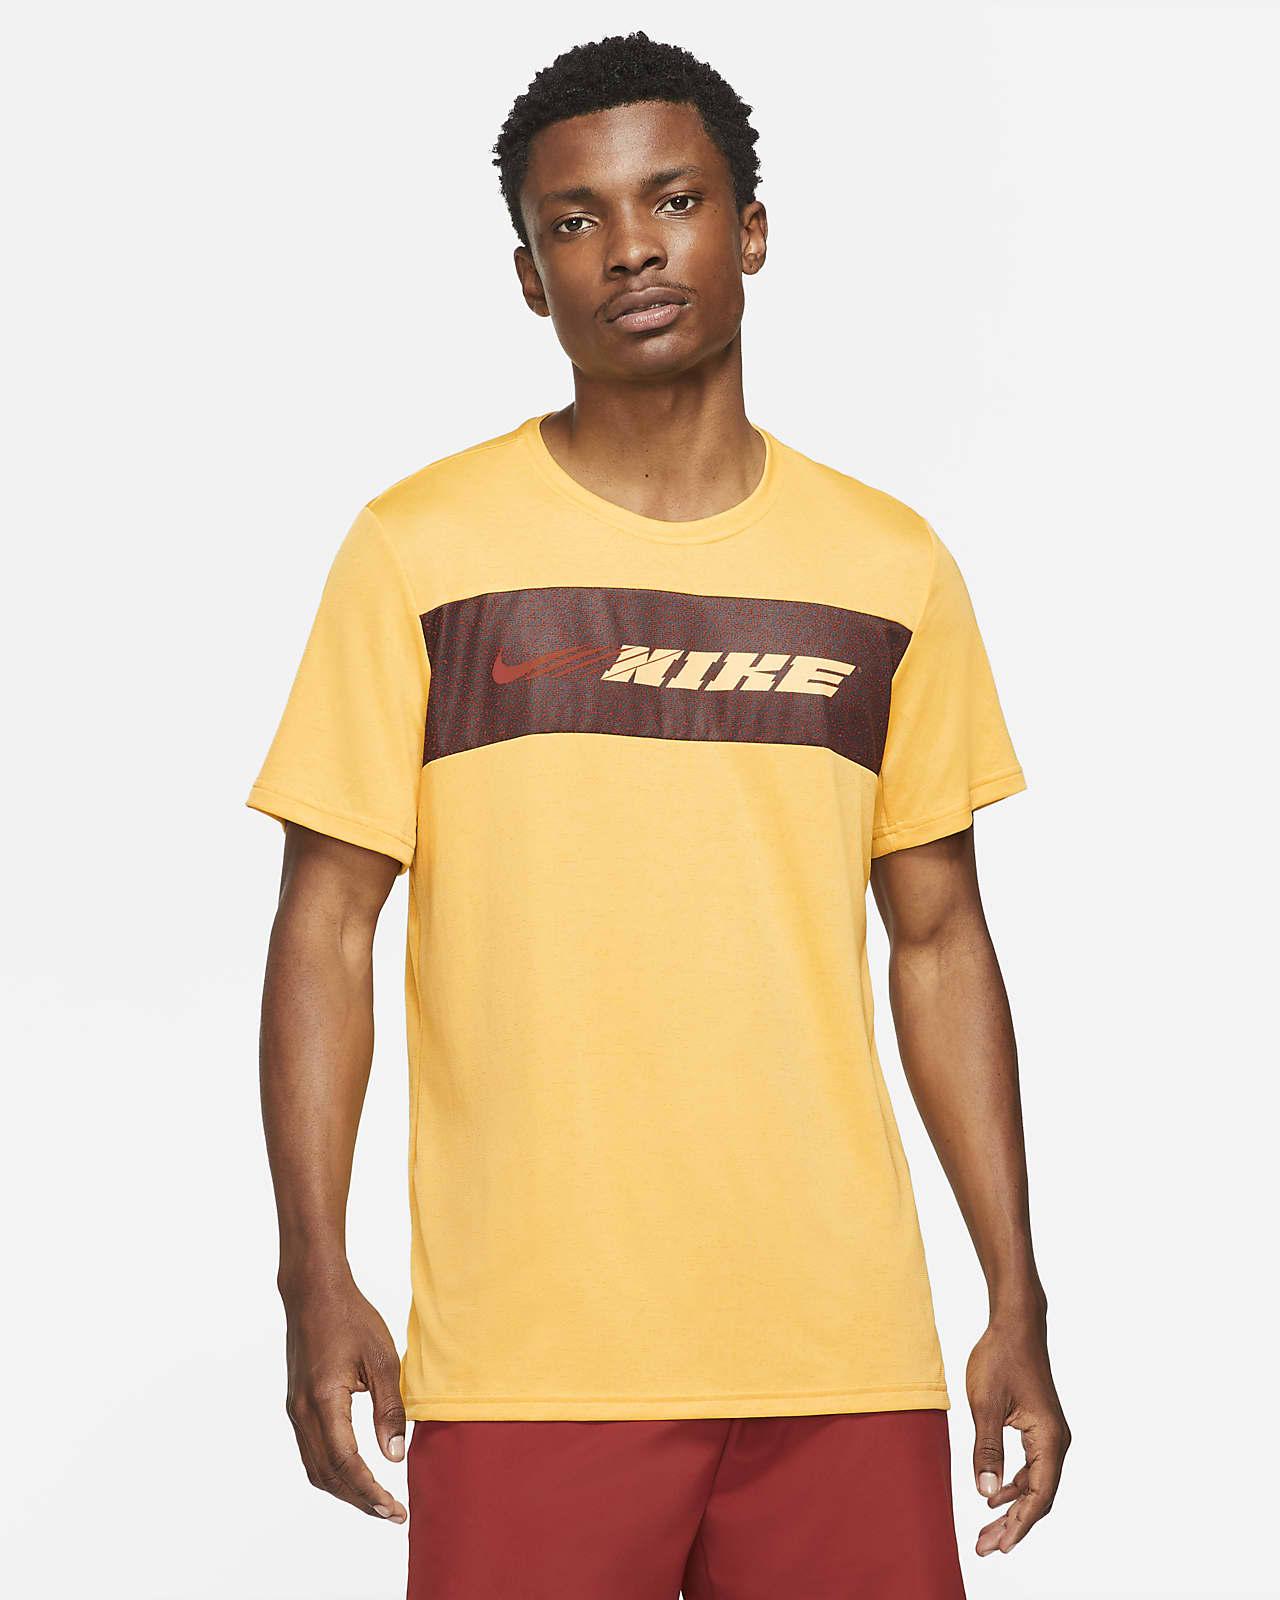 Nike Dri-FIT Superset Sport Clash Kısa Kollu Erkek Antrenman Üstü